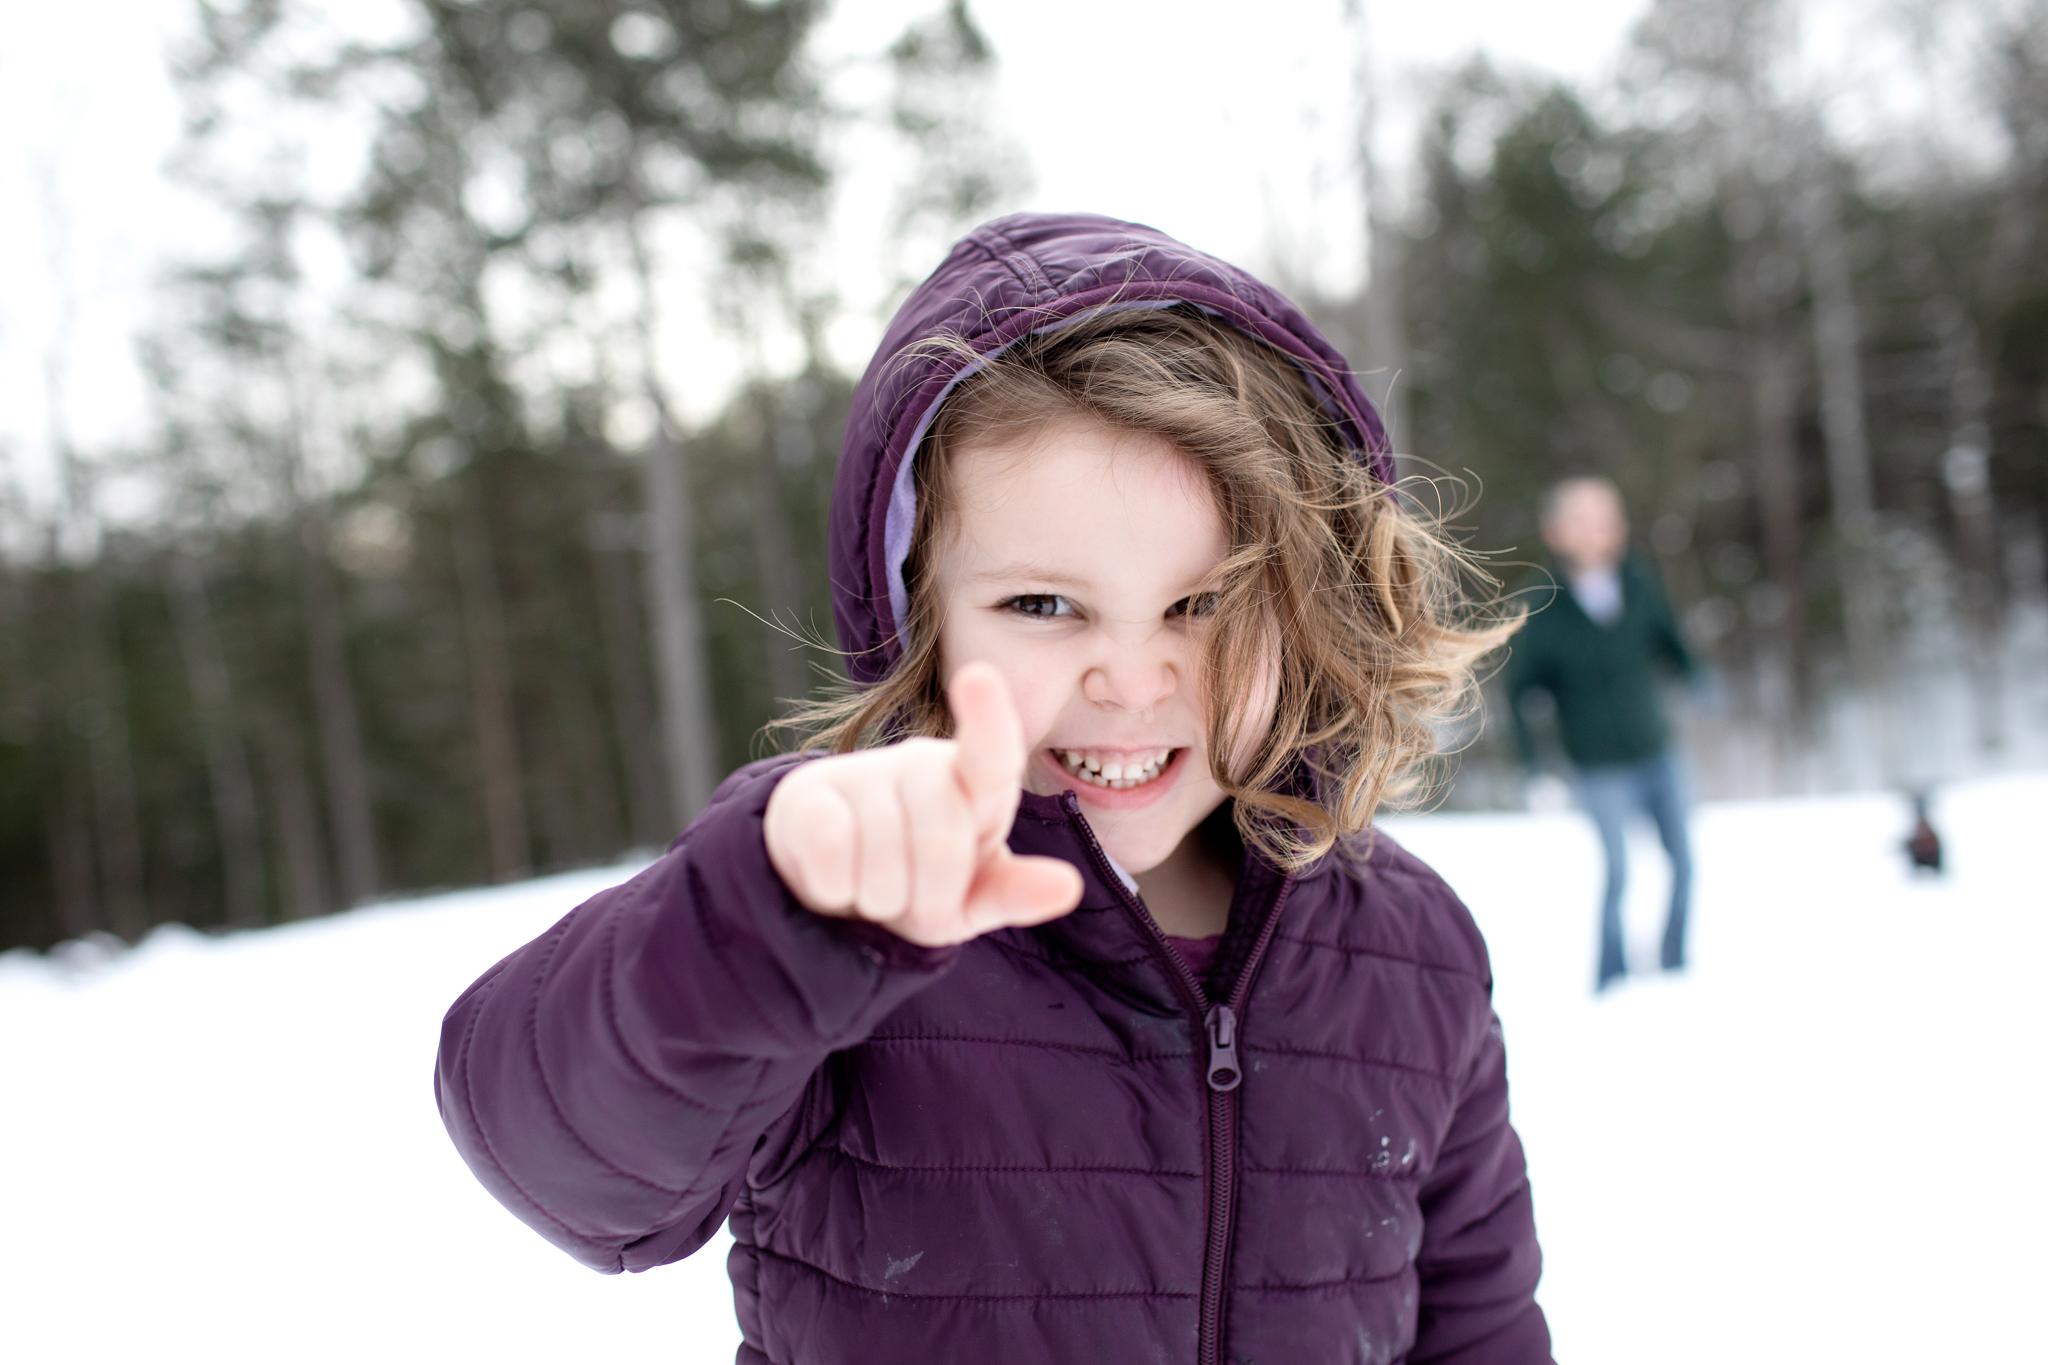 maine-winter-family-photographer-stepheneycollins-20.jpg